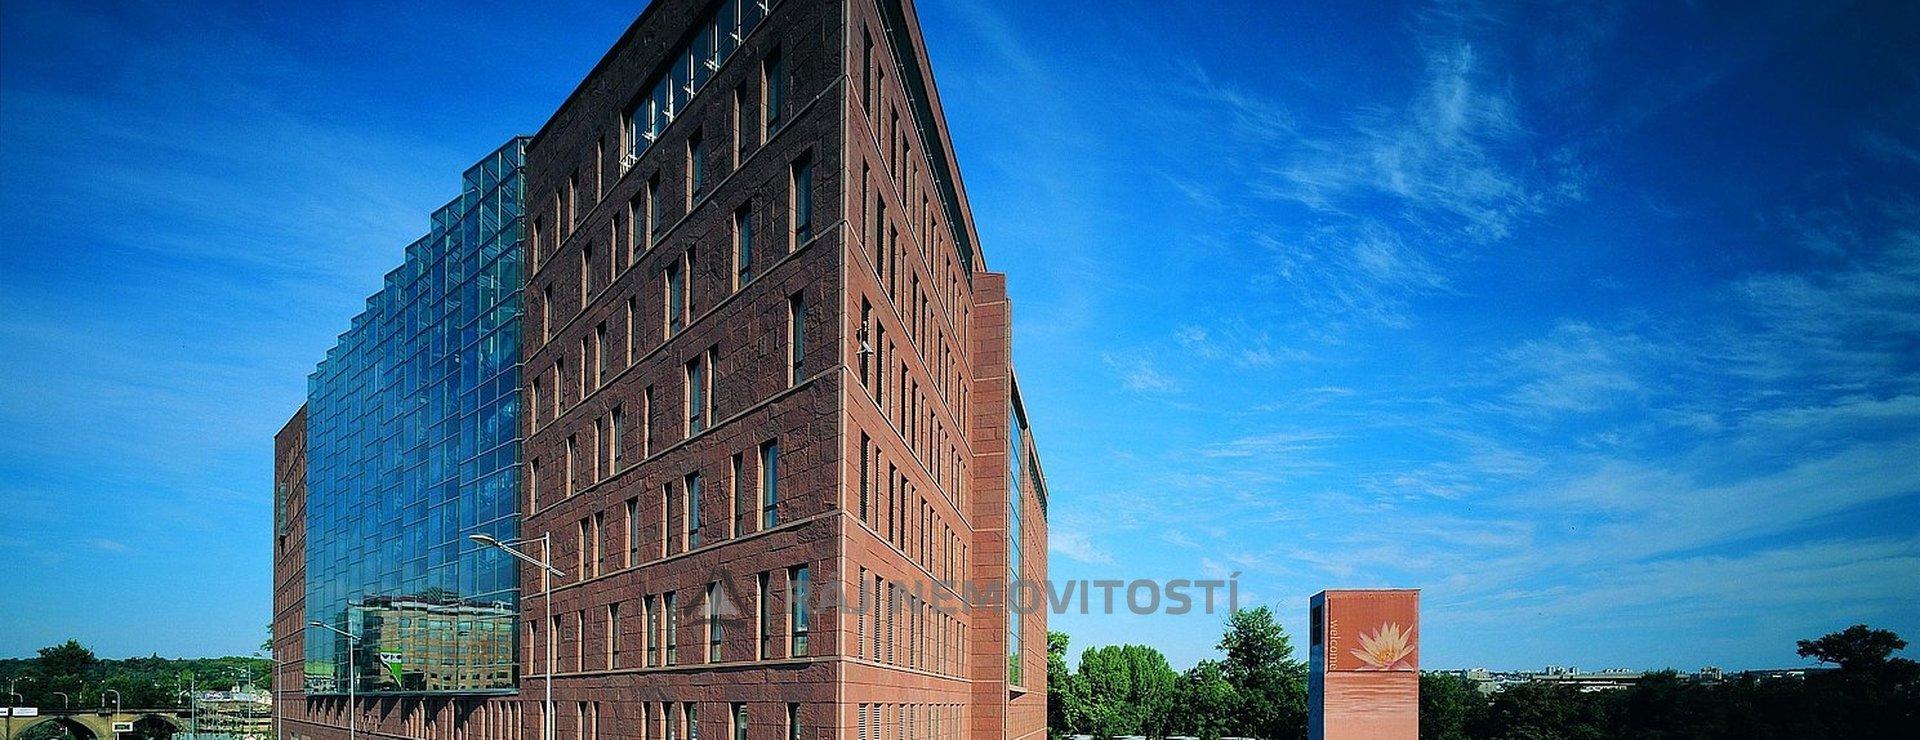 csm_Prag-River-City-Danube-House-aussen-1_9be7d7f365